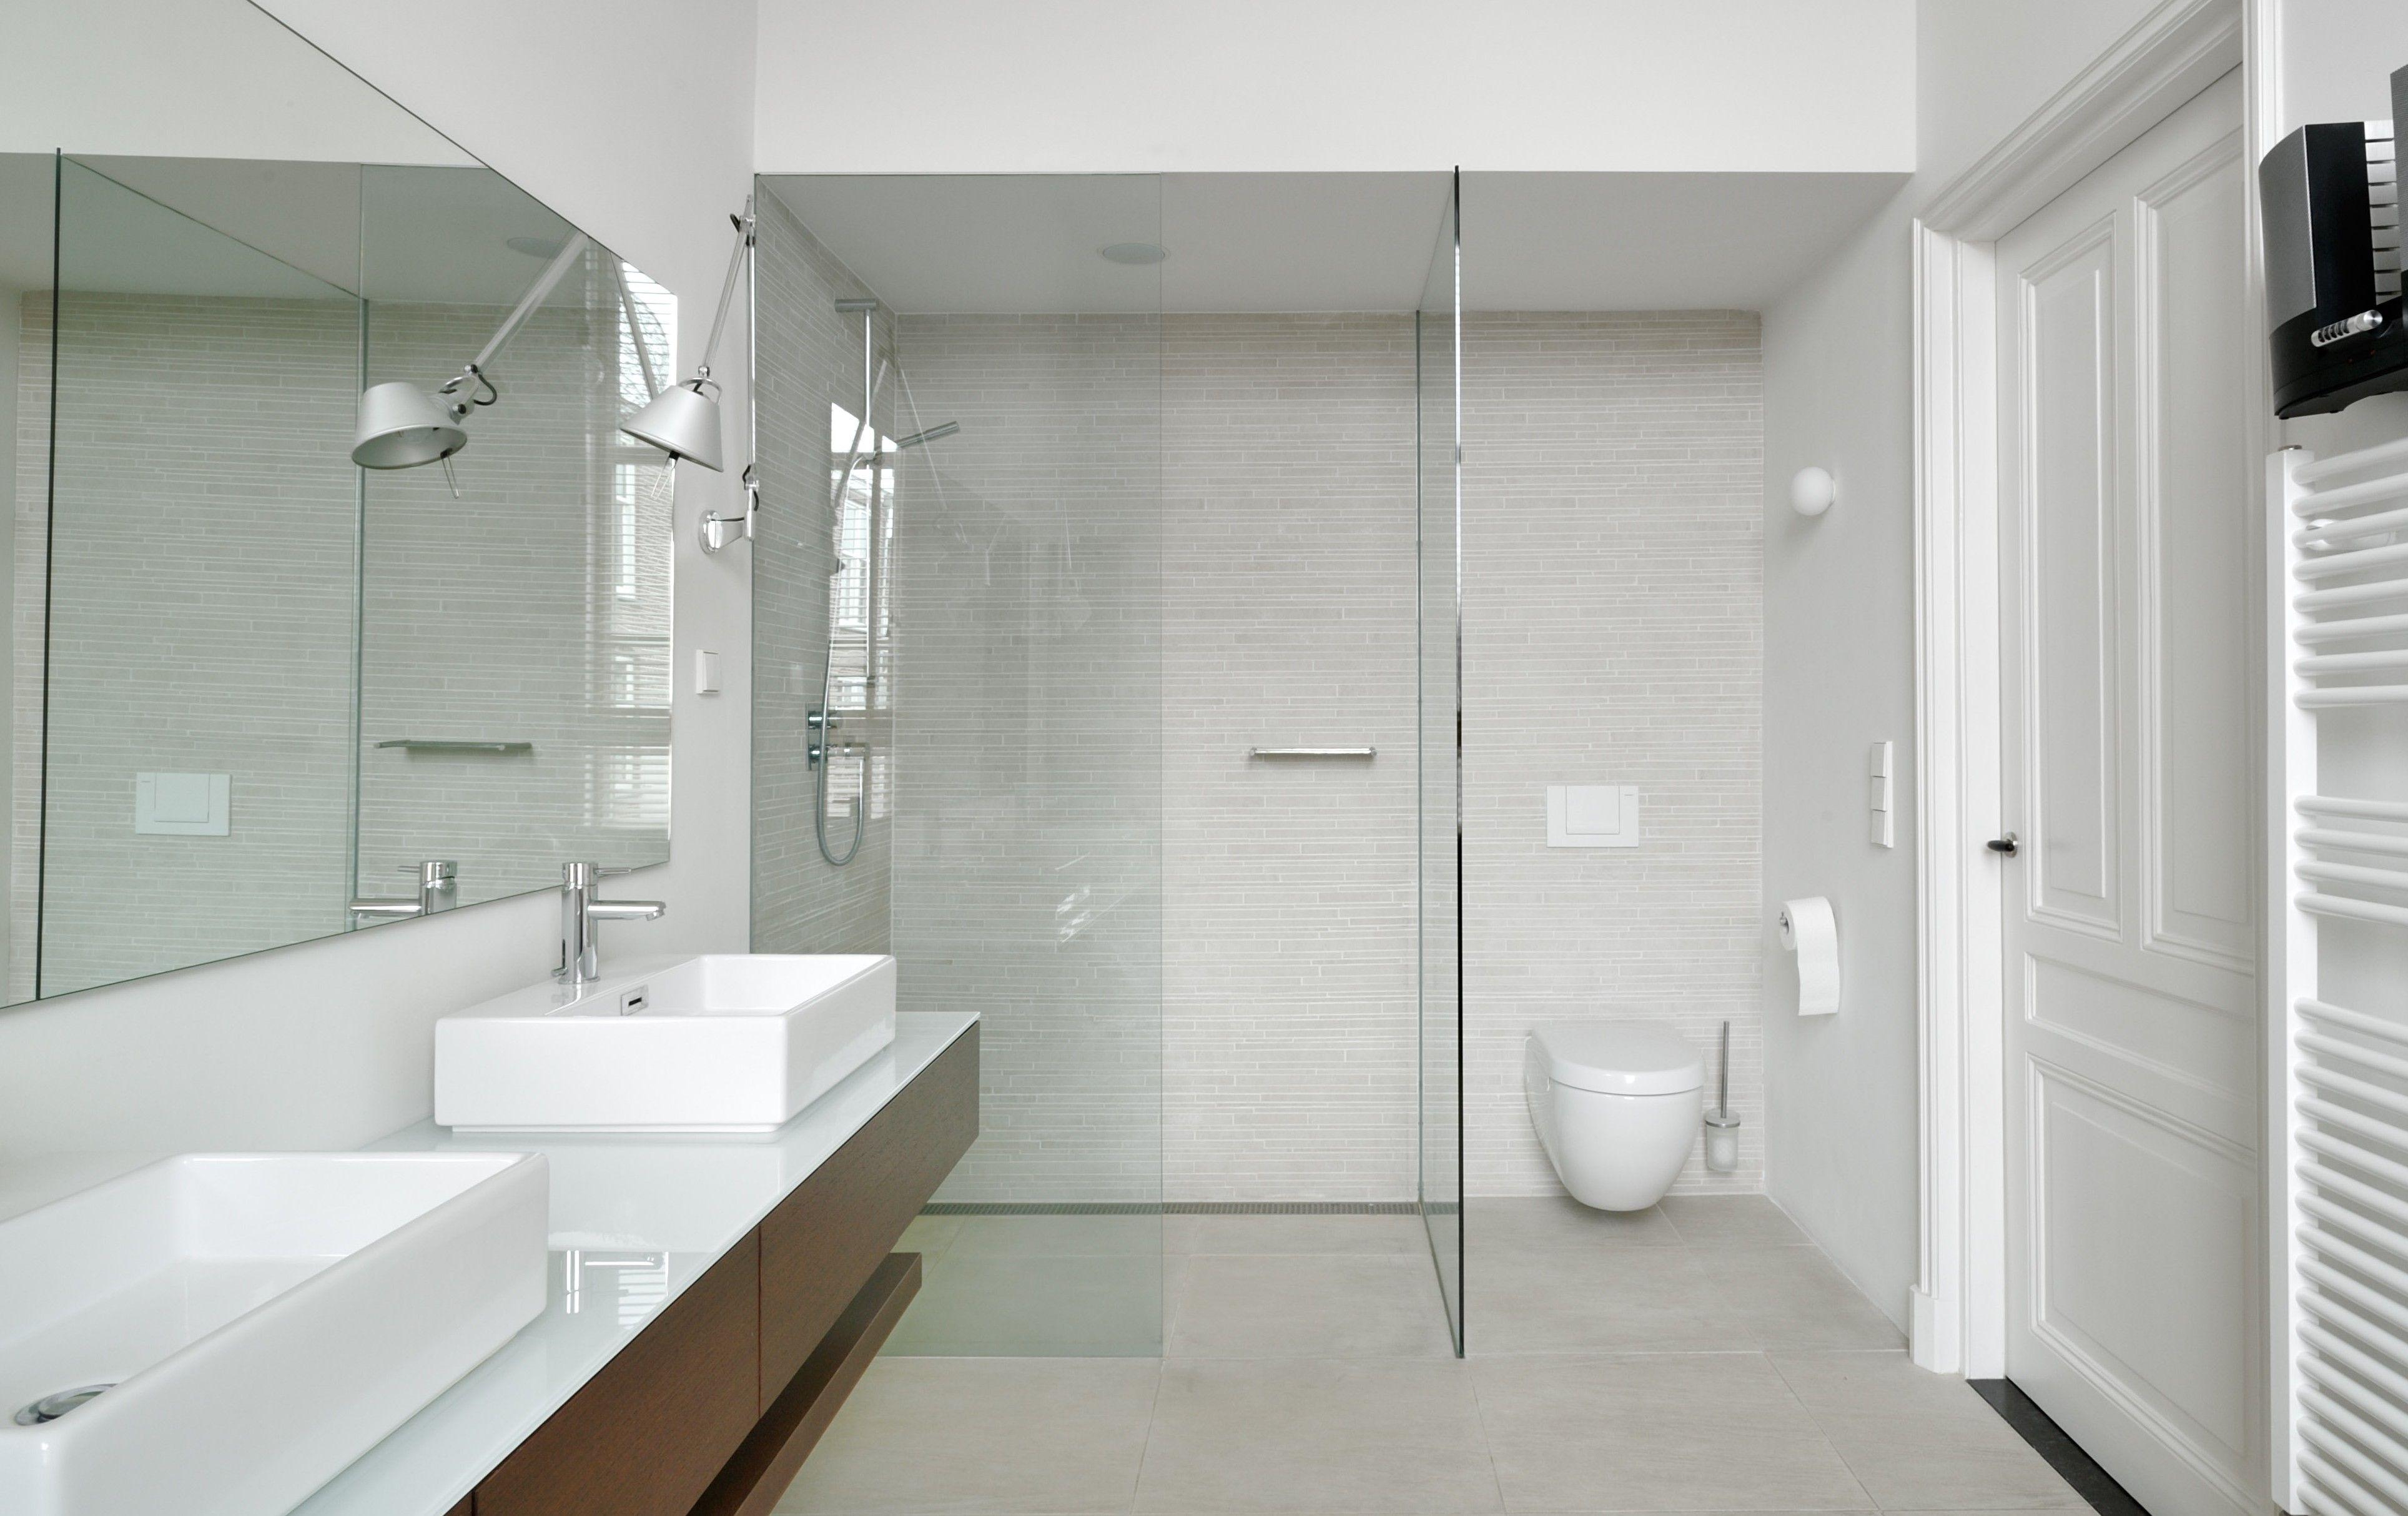 Handige Indeling Badkamer : Handige indeling badkamer badkamer badkamer